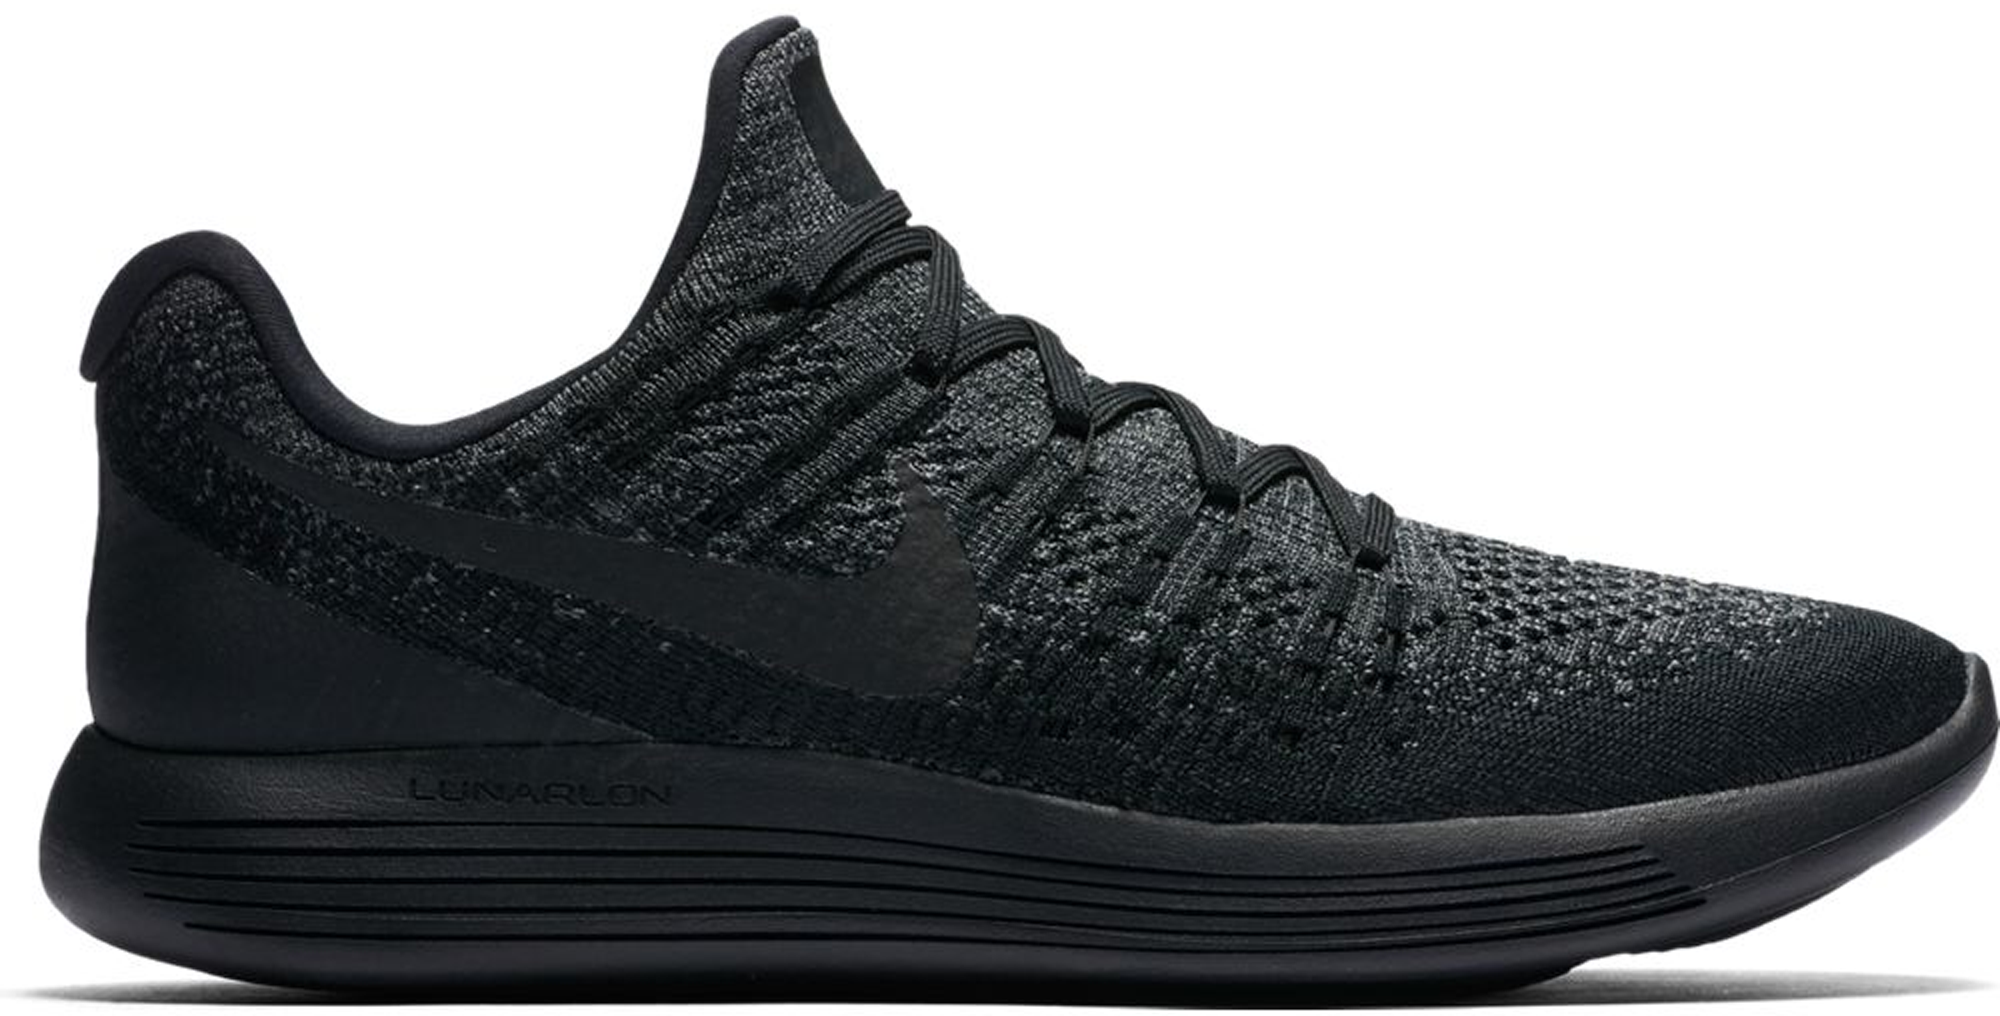 Nike Lunar Epic Low Flyknit 2 Black